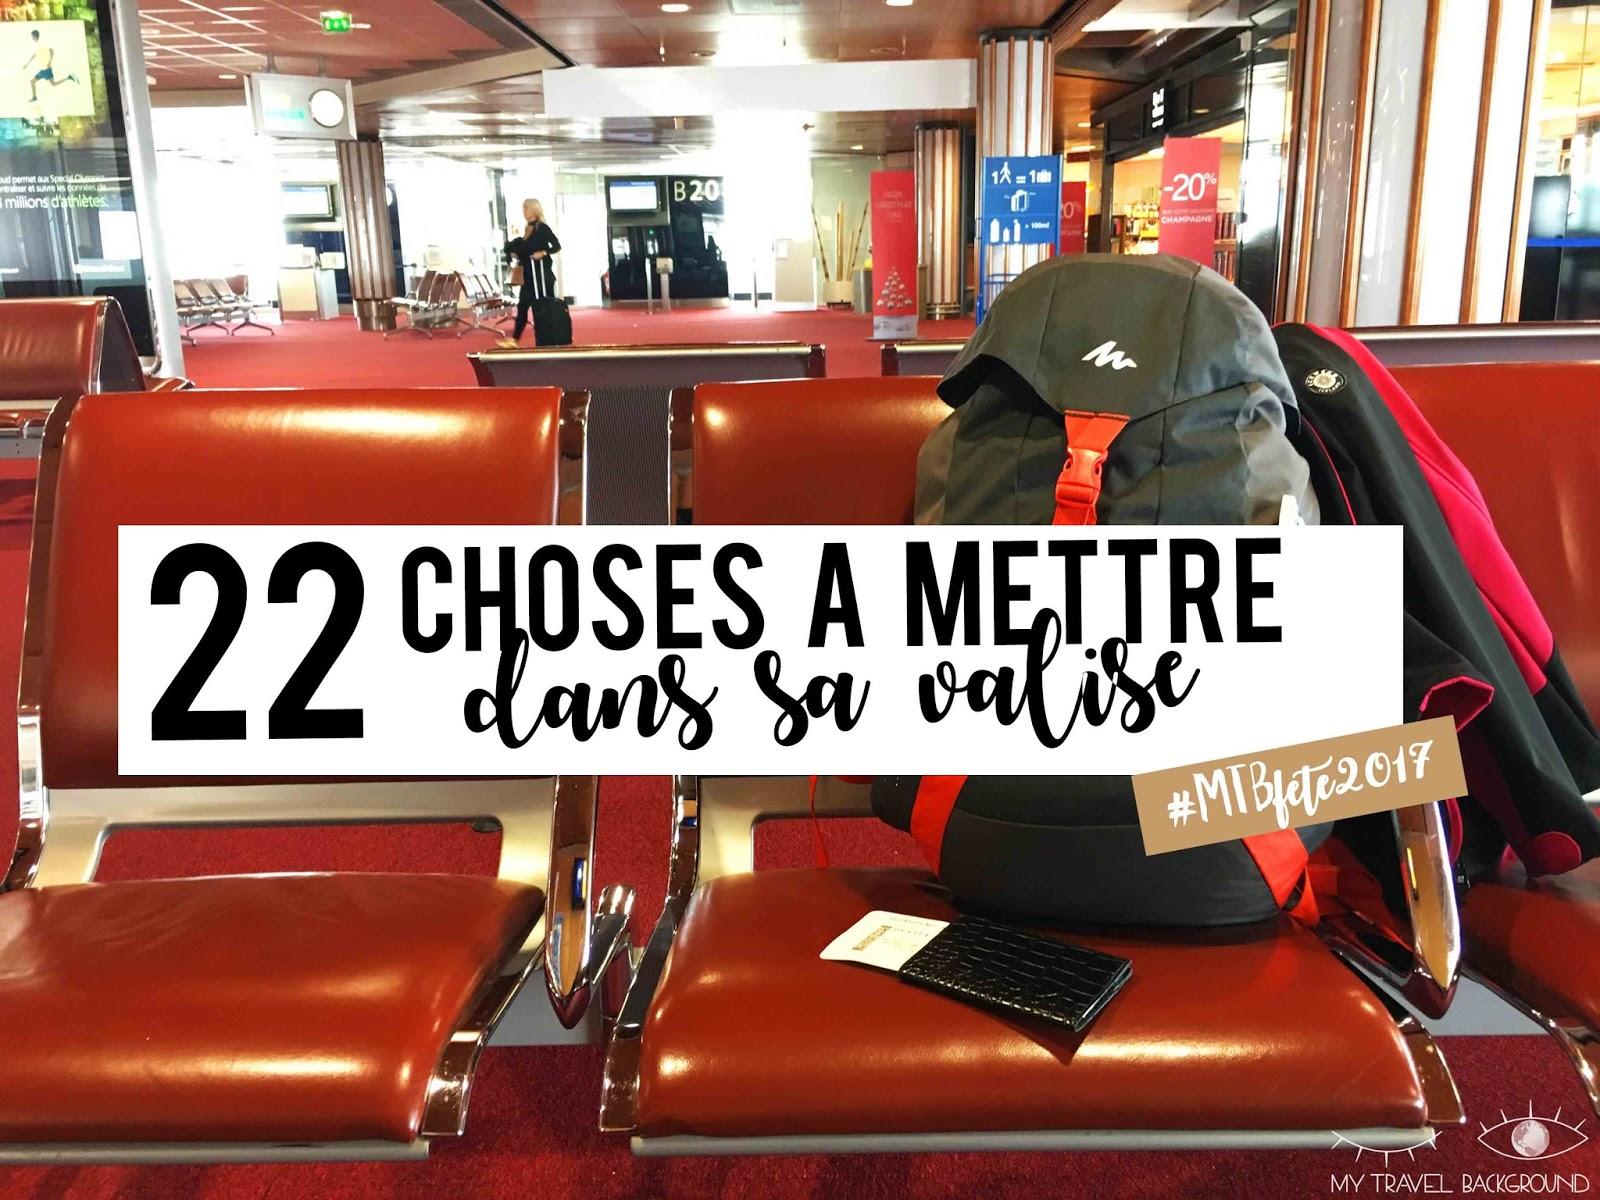 My Travel Background : 22 choses à mettre dans sa valise